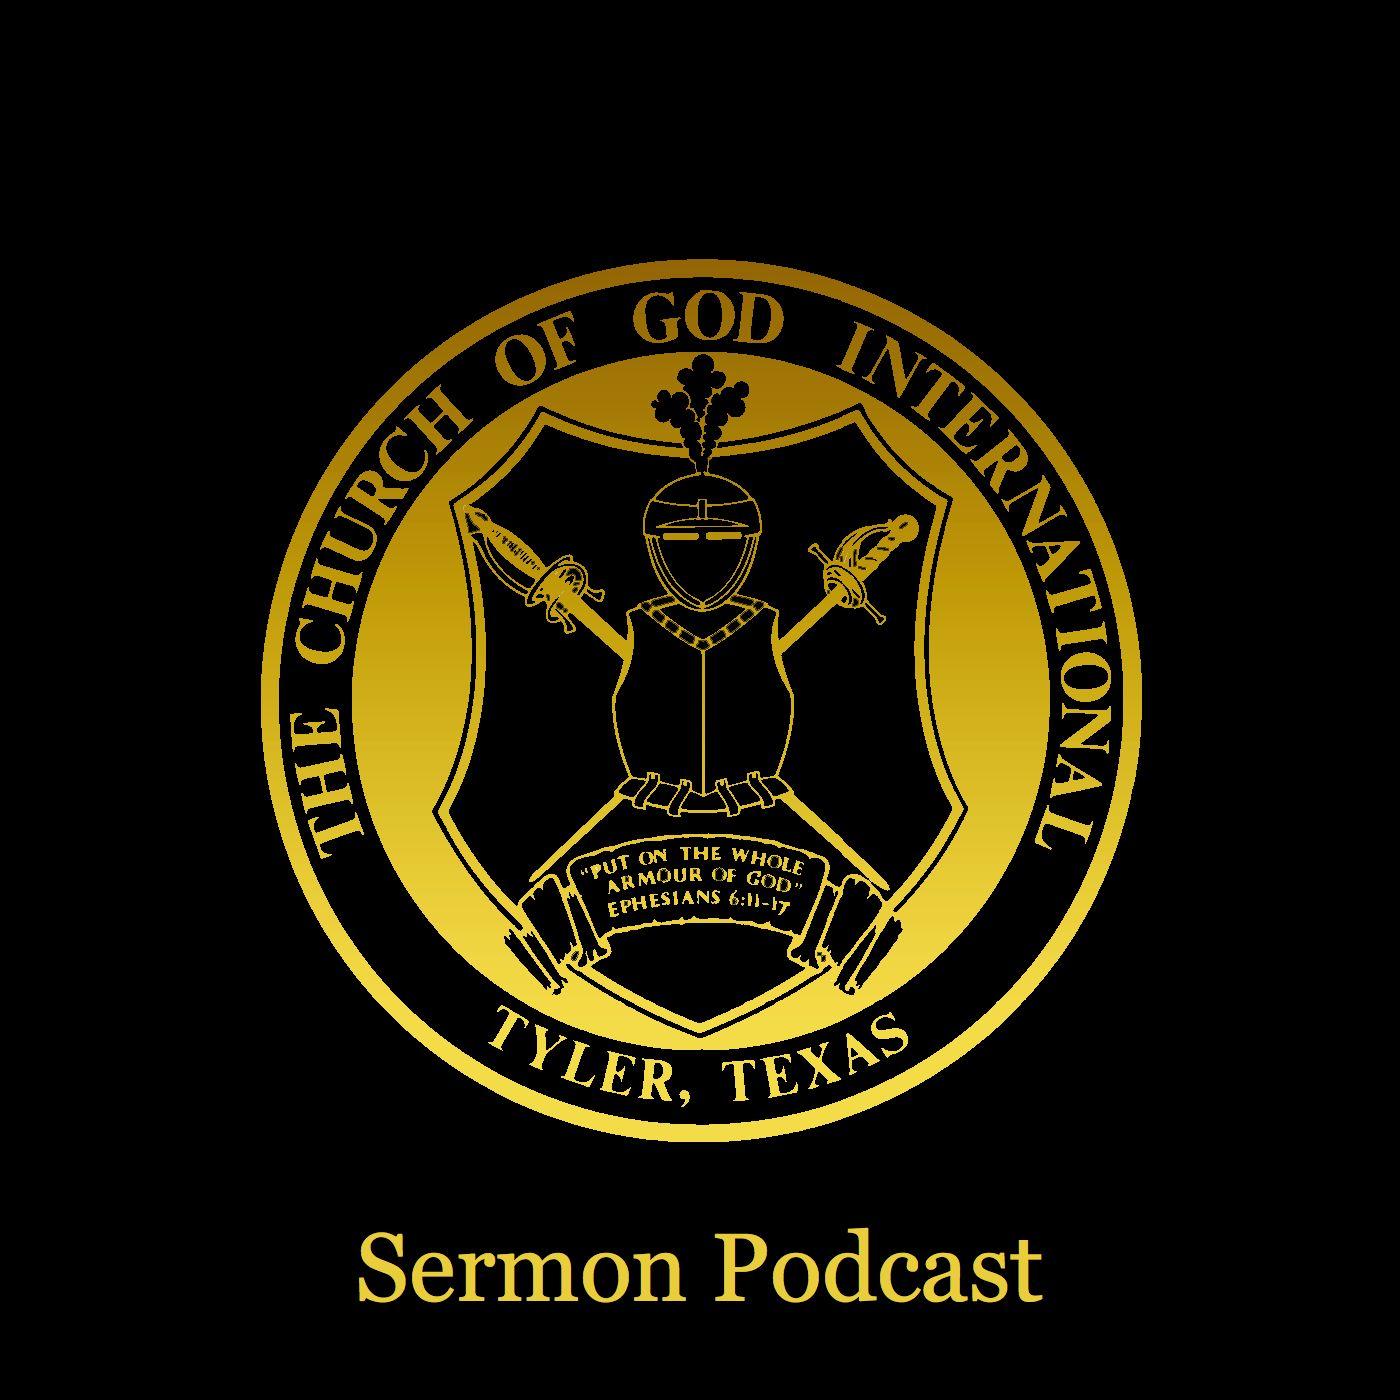 Sermon Audio - The Church of God International